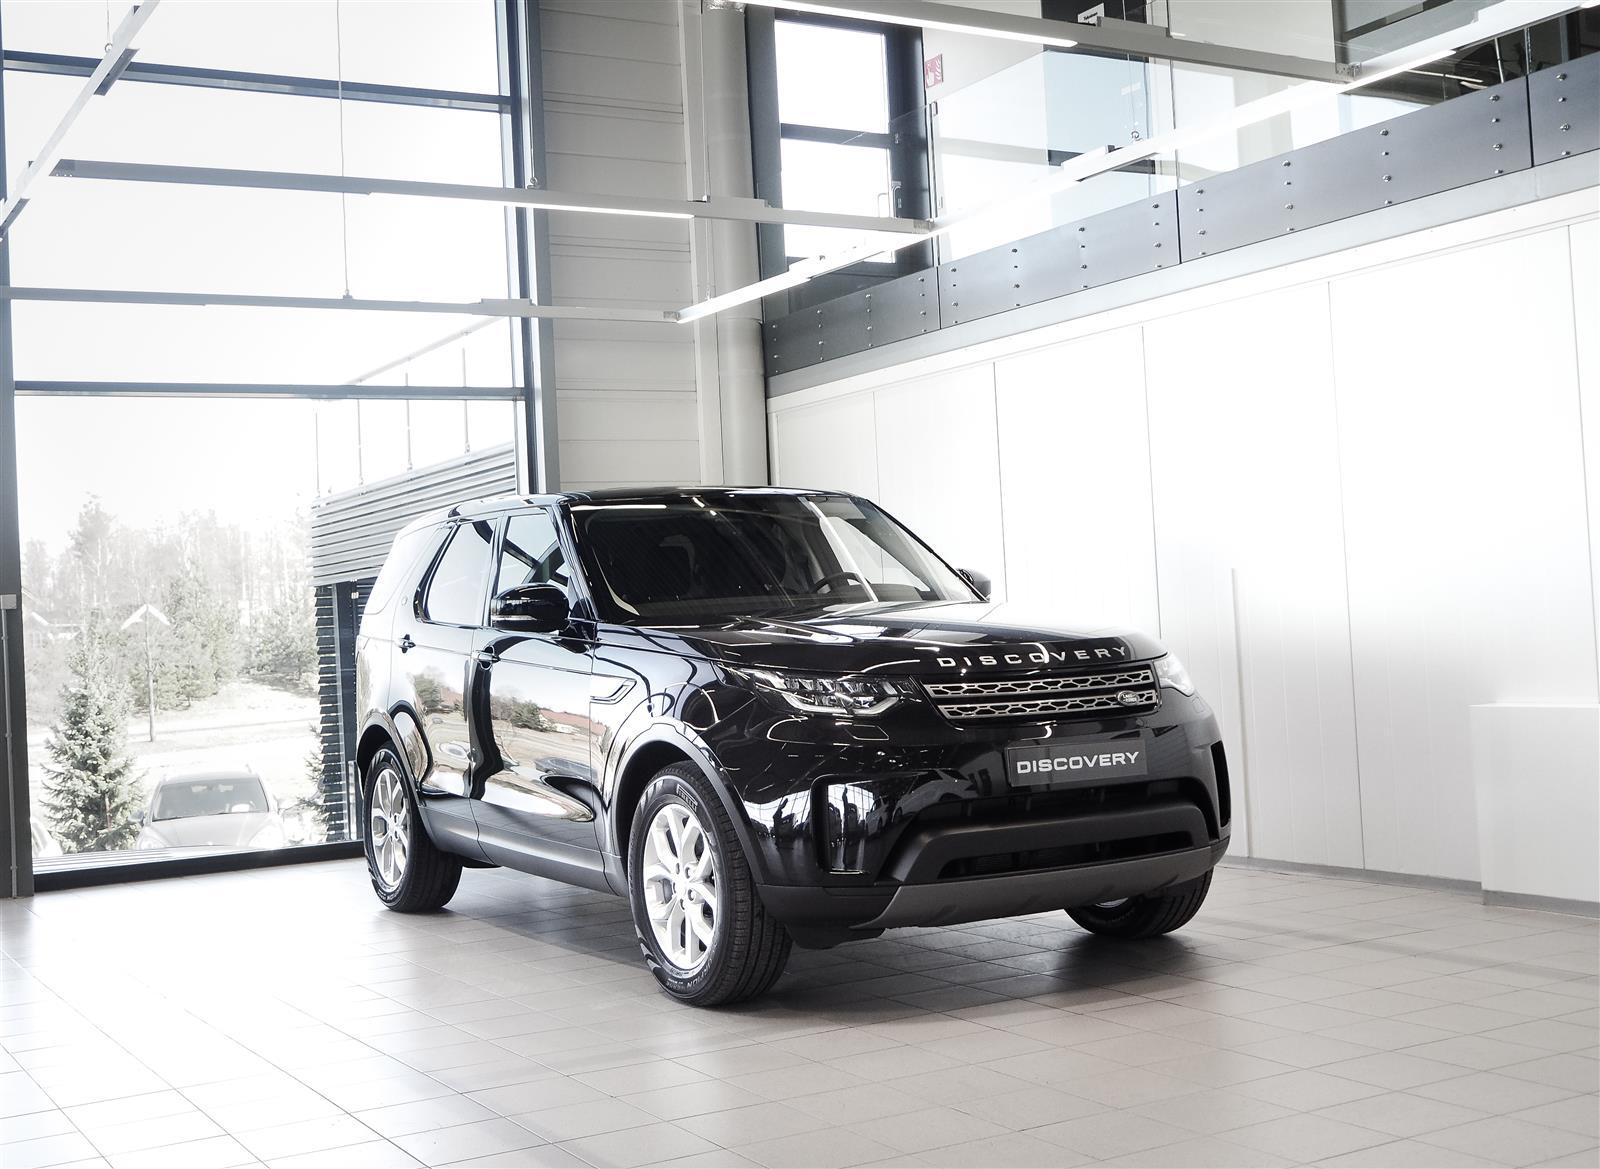 Land Rover Discovery 2,0 Td4 Aut // 2-hlö alennetun autoveron pakettiauto + Sis. ALV 24% + Korkotarjous 0,9%*